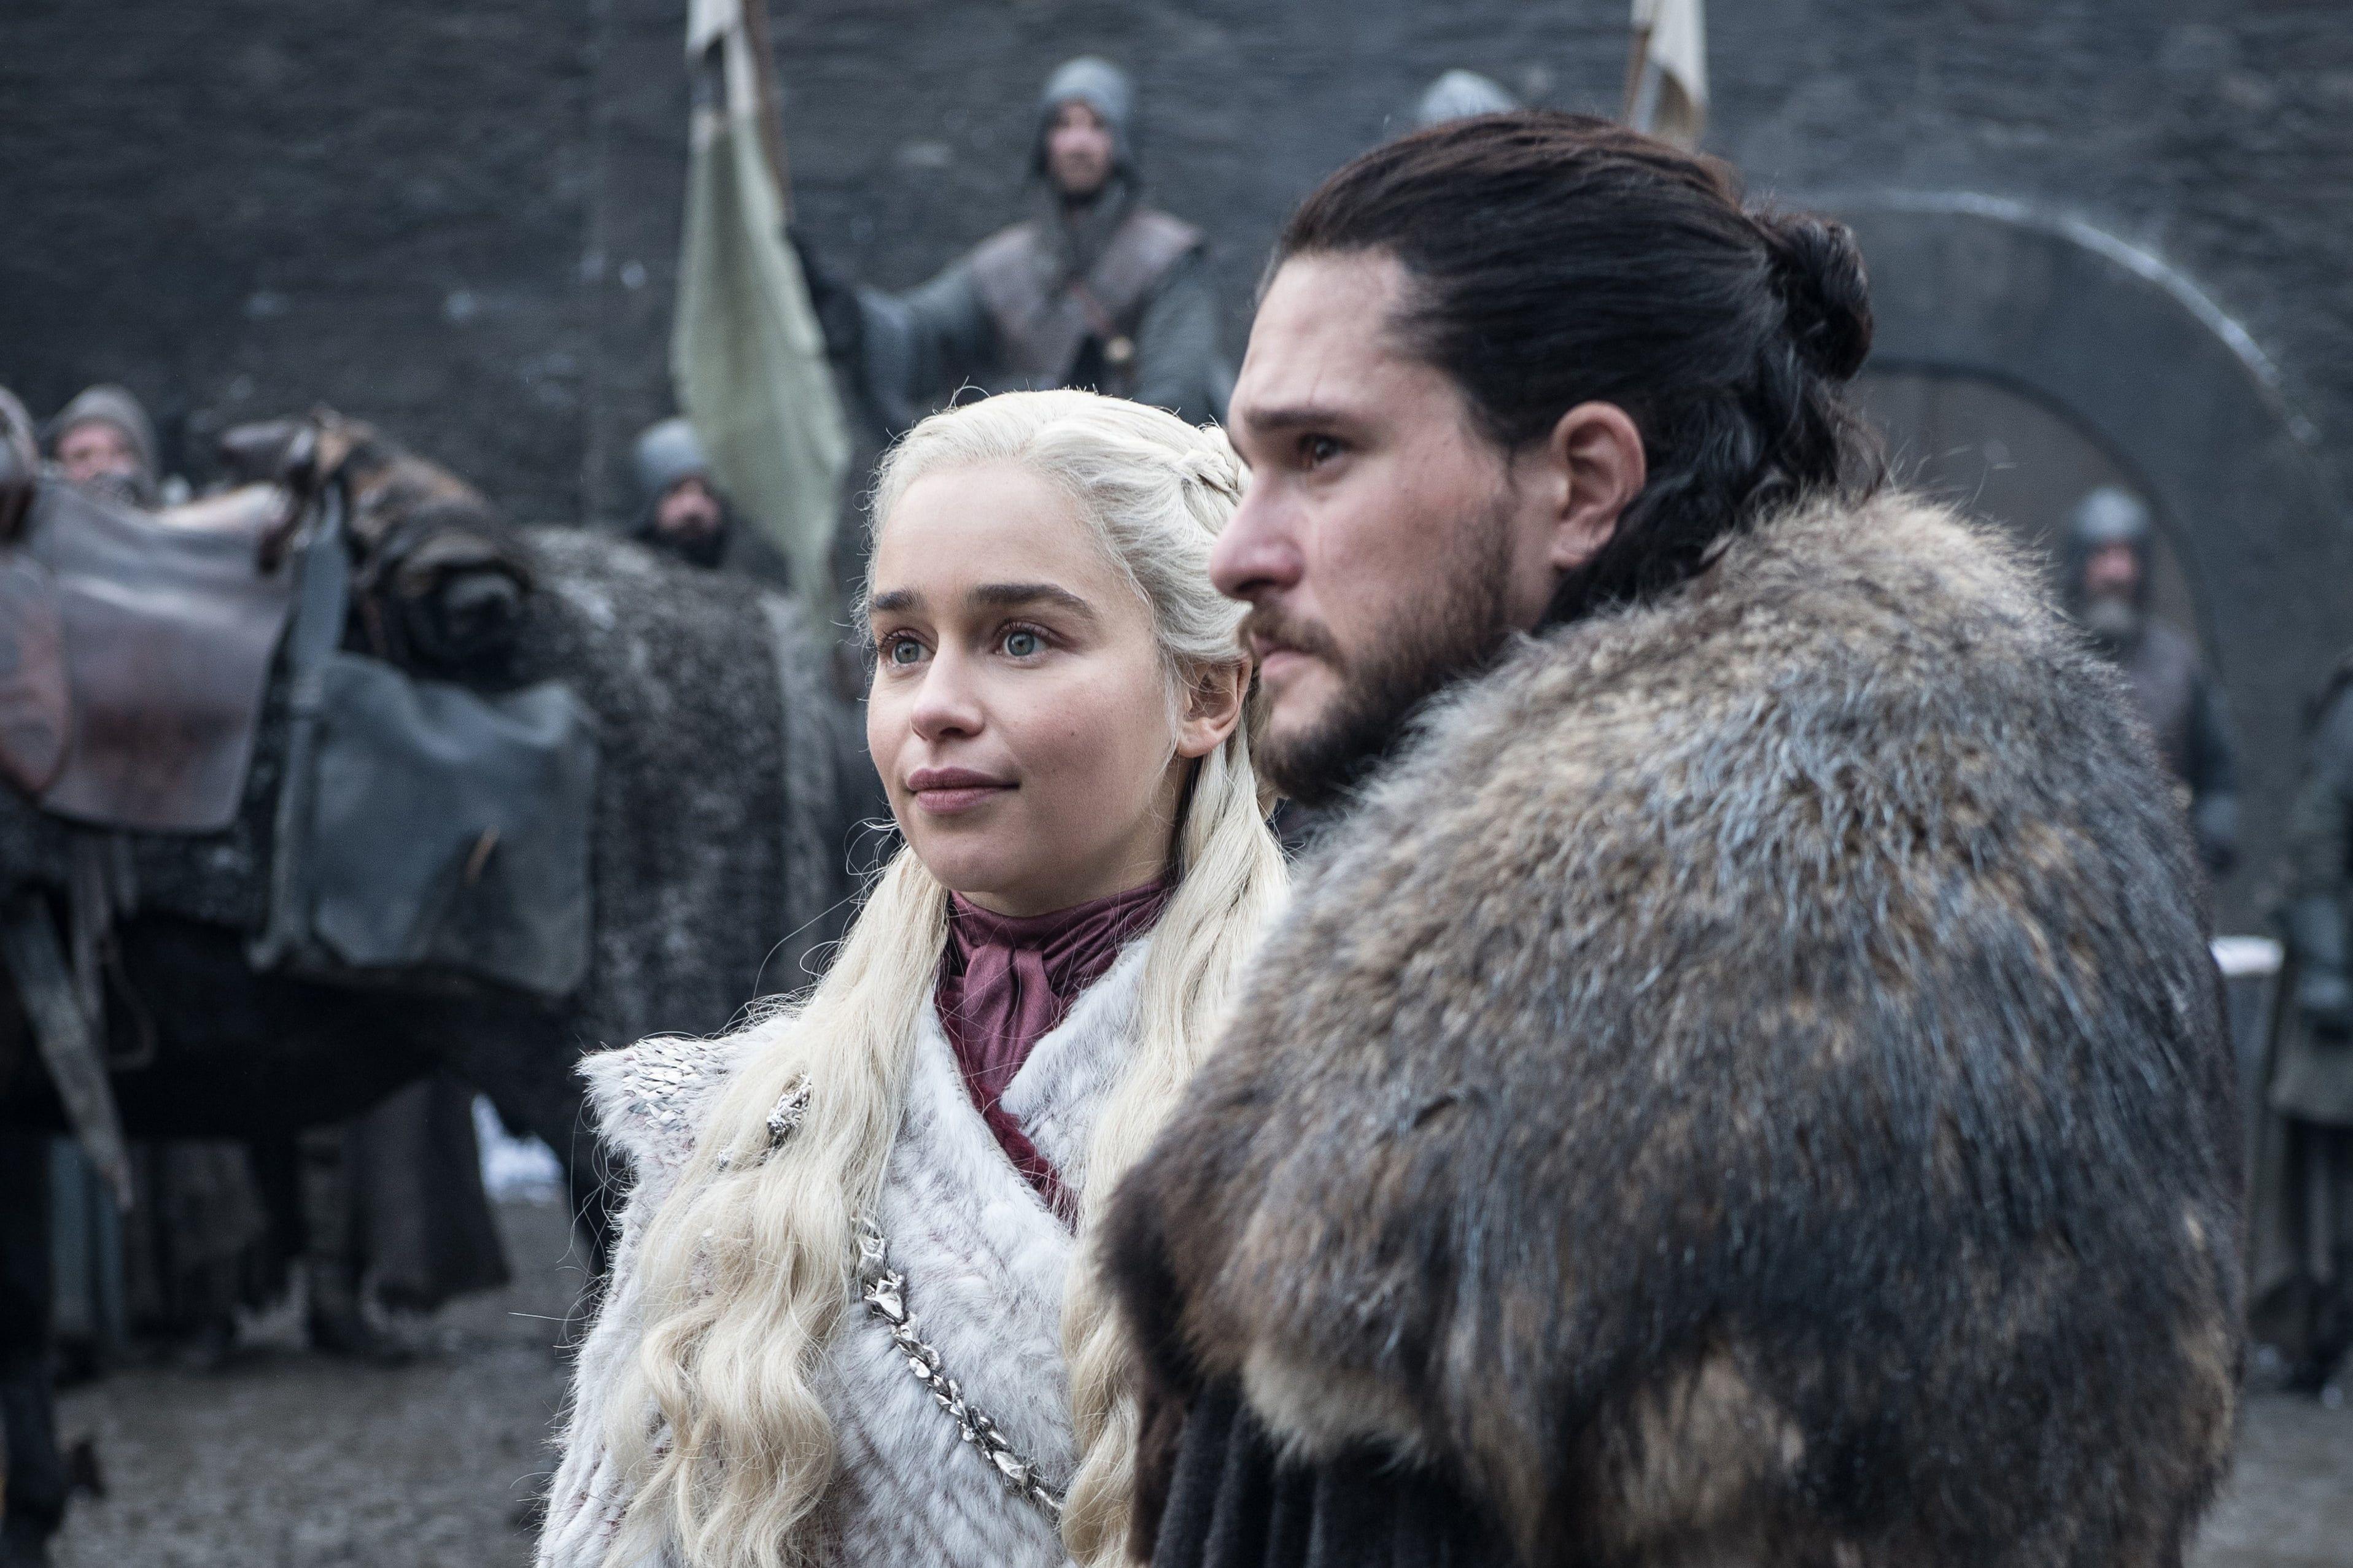 Tv Show Game Of Thrones Daenerys Targaryen Emilia Clarke Jon Snow Kit Harington 2k Wal Jon Snow Wallpapers Daenerys Targaryen And Jon Snow Daenerys Targaryen